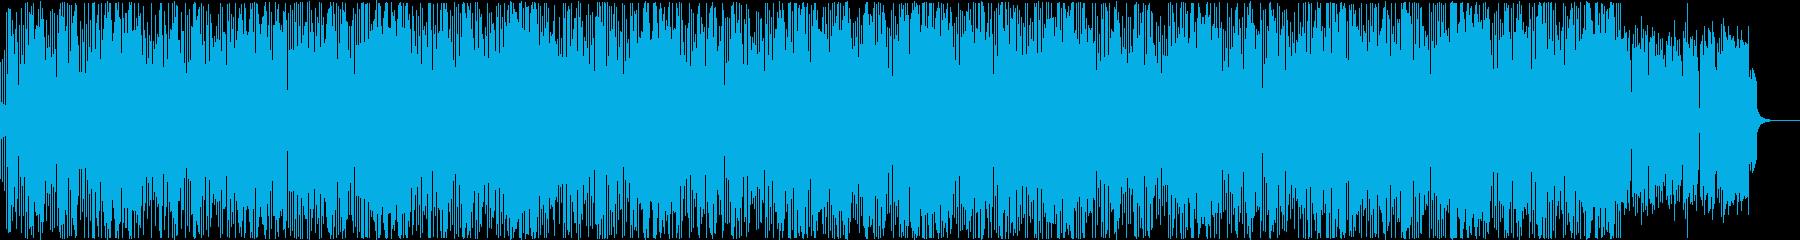 CM、企業VPFuture Bass bの再生済みの波形